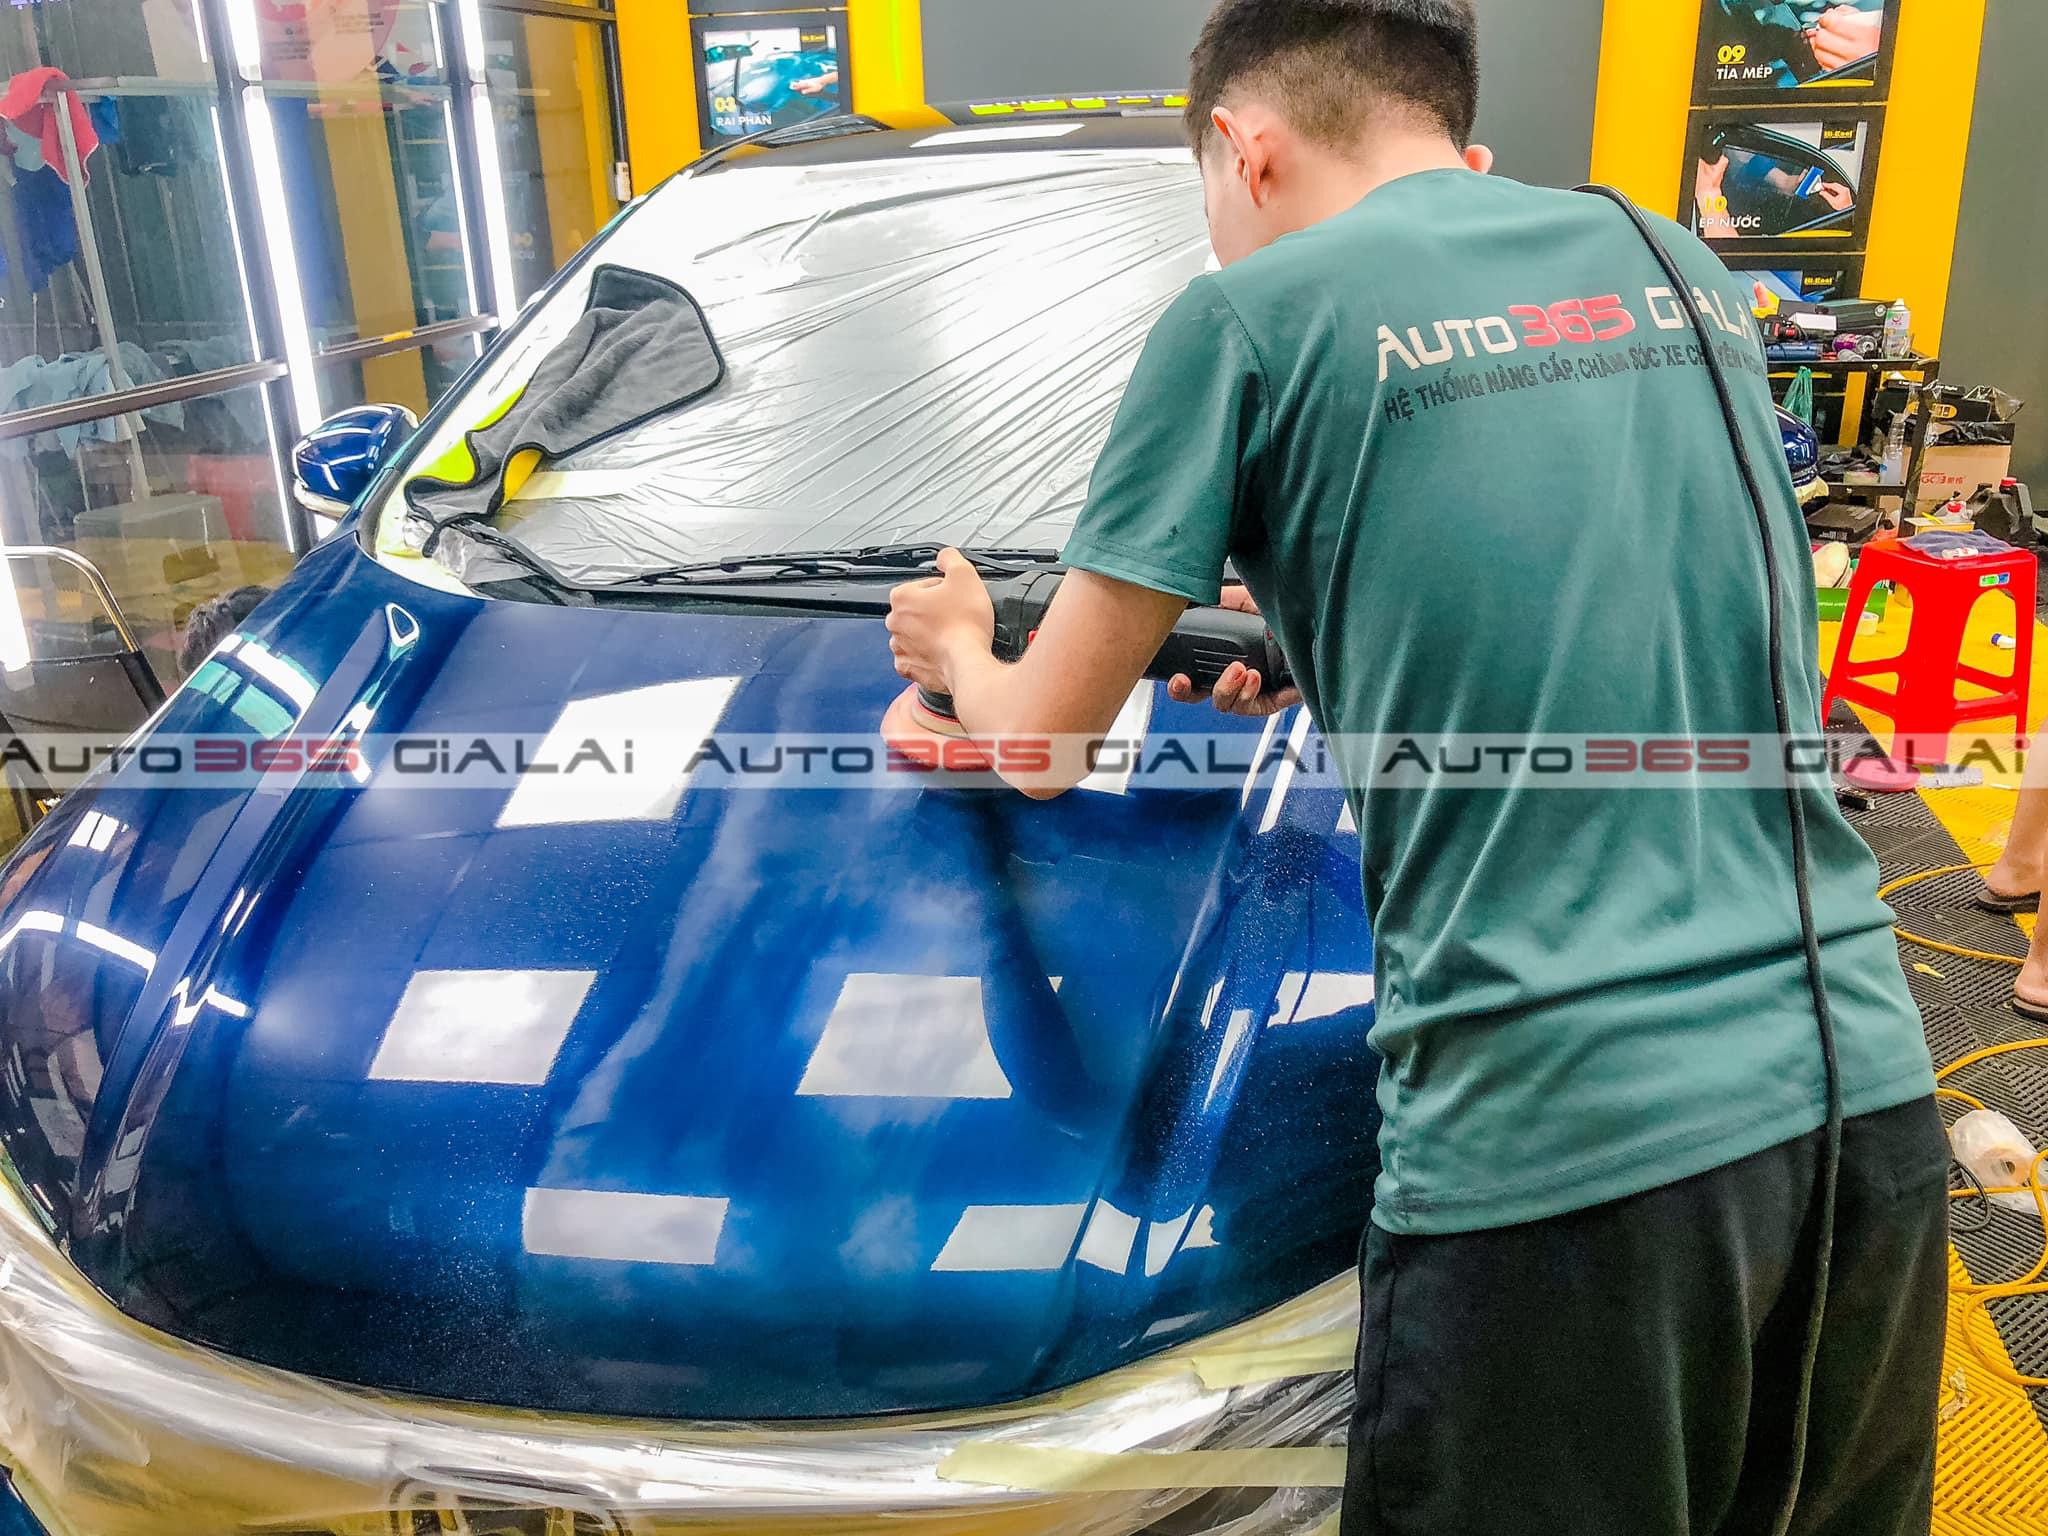 auto365-dai-ly-gia-lai-phu-ceramic-sgcb-4